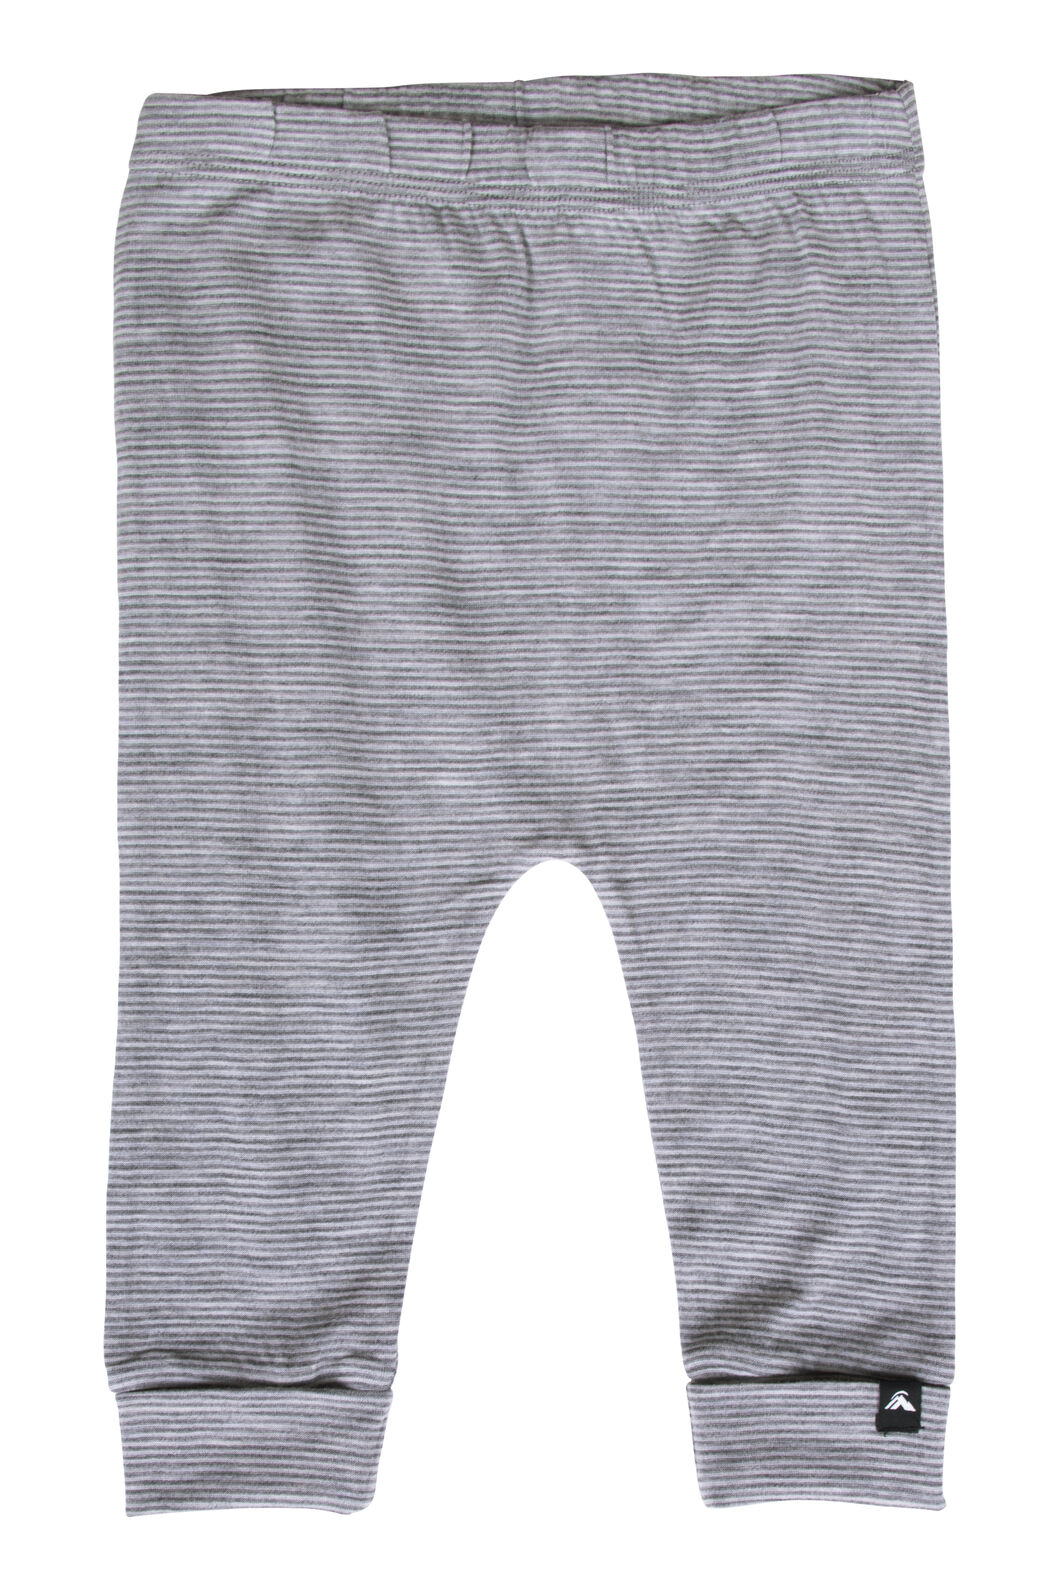 Macpac Baby 150 Merino Long Johns, Light Grey Stripe, hi-res